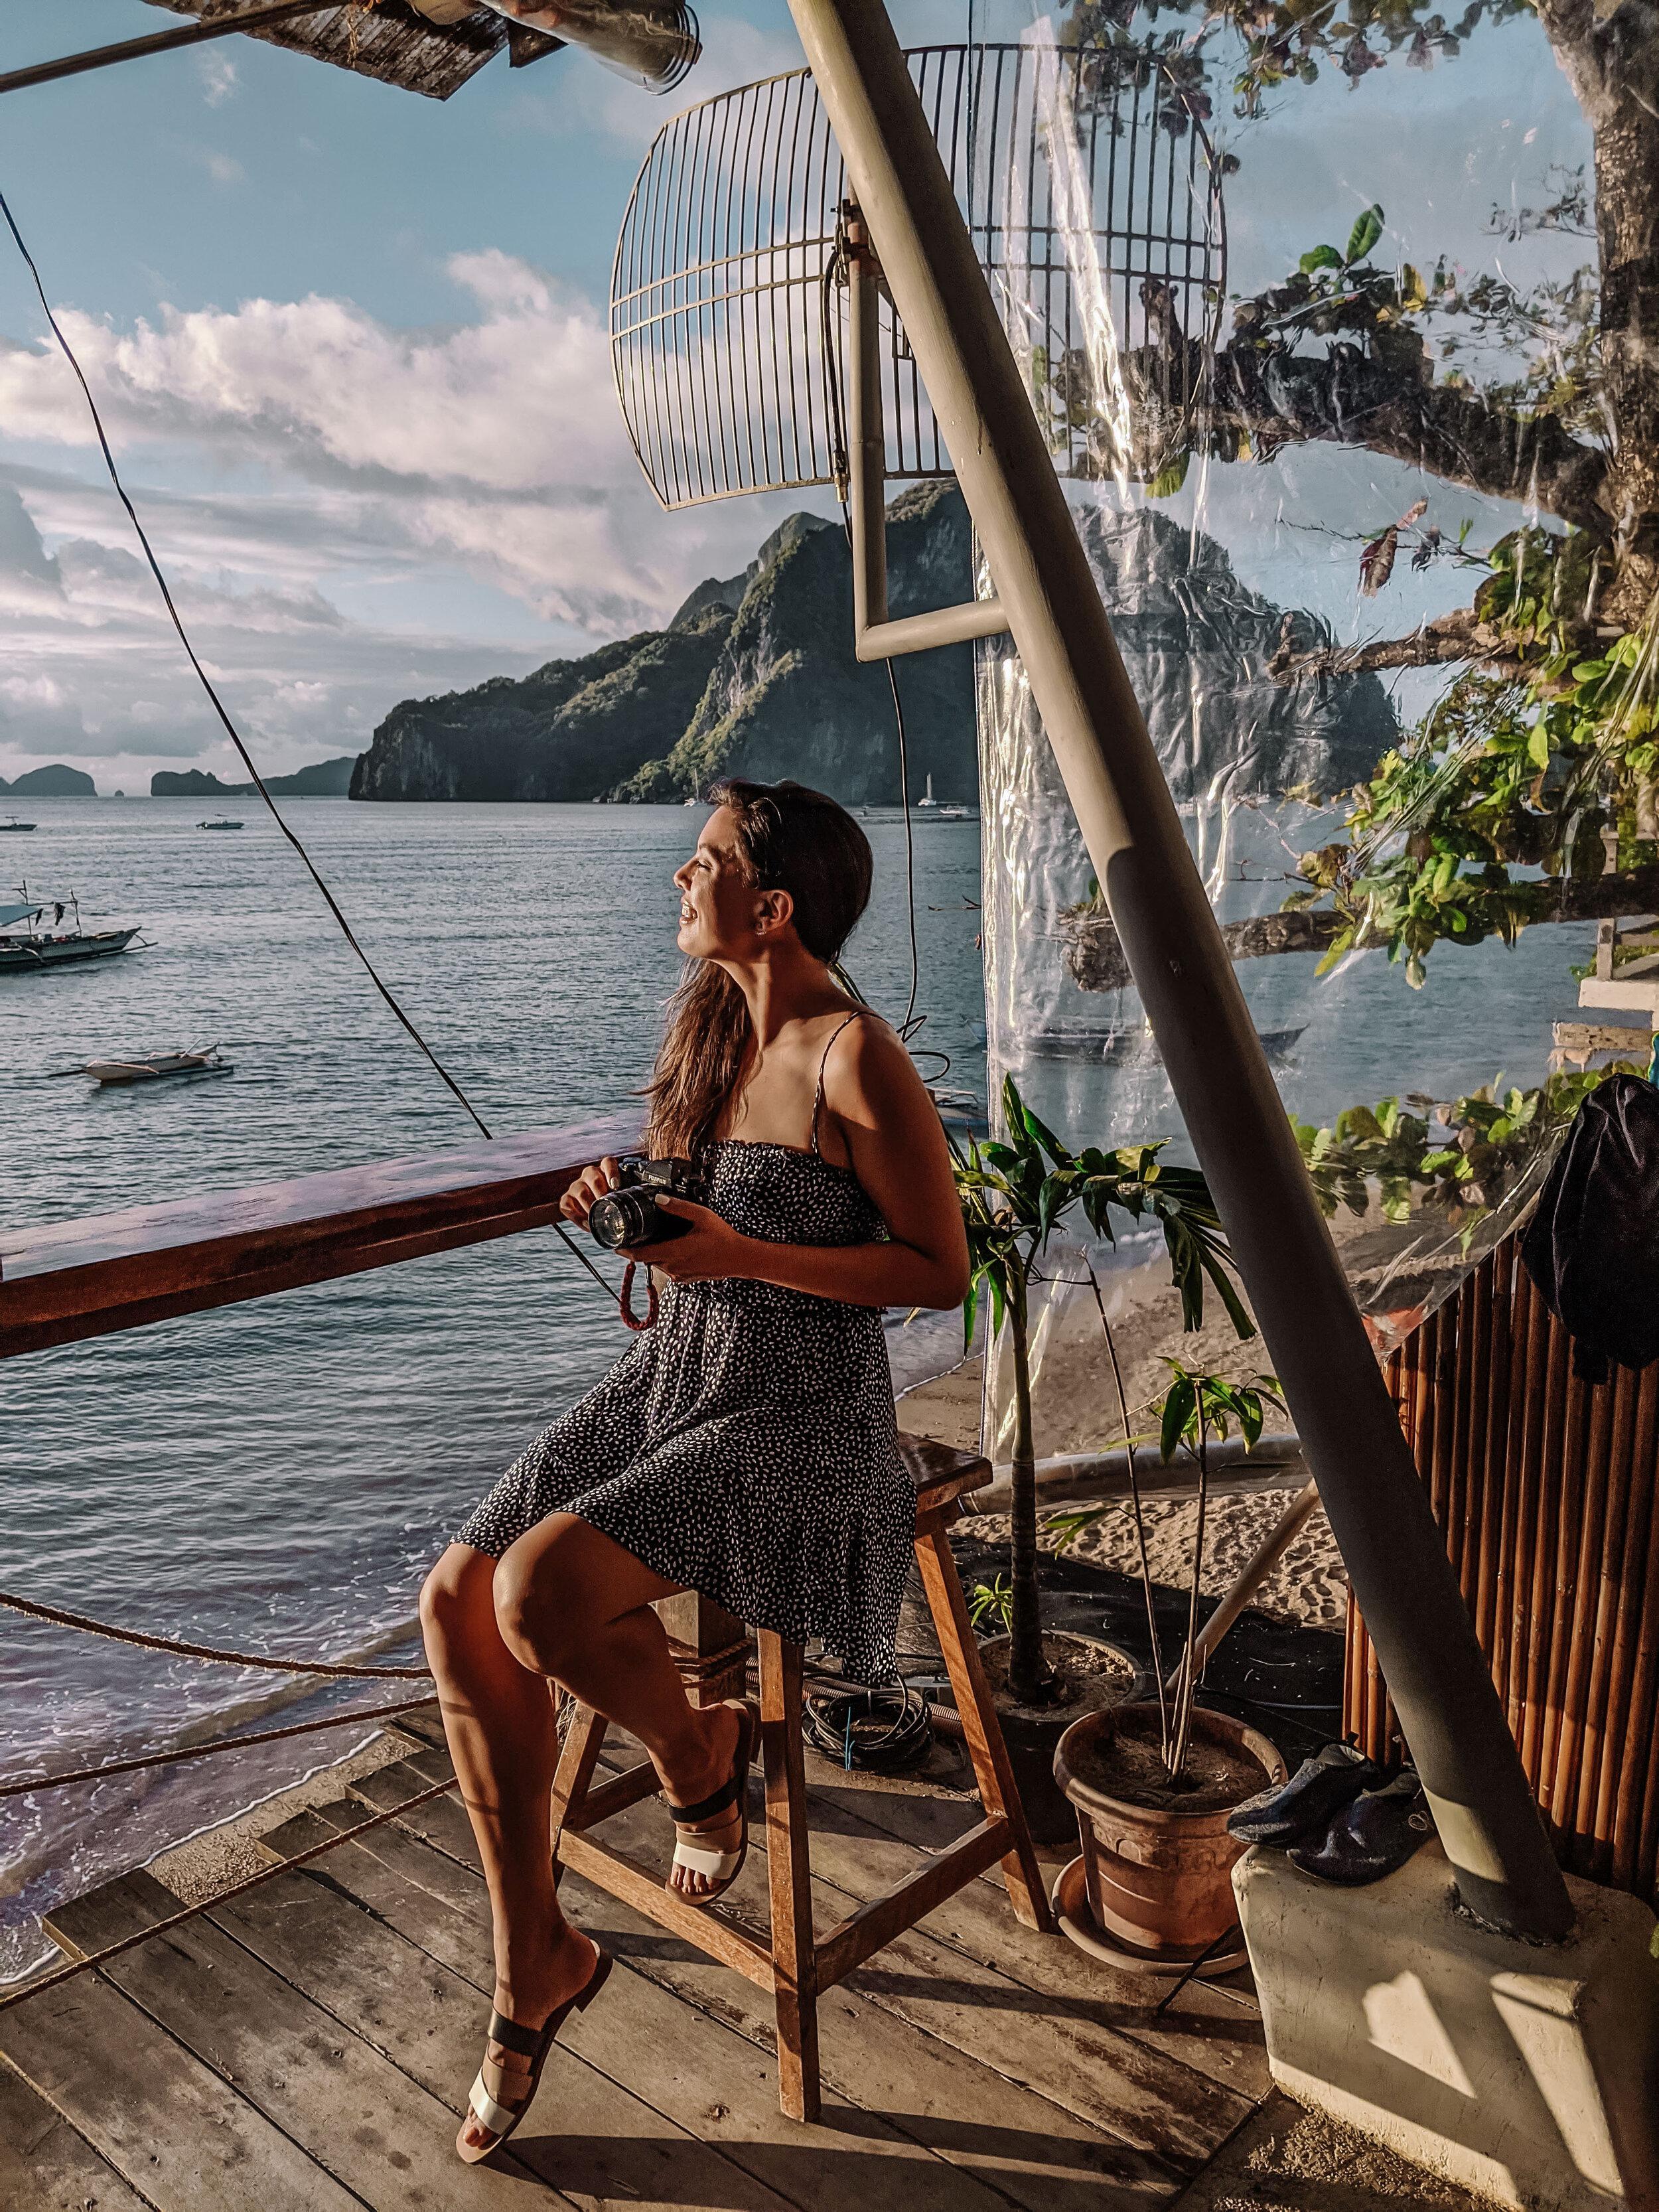 Rachel Off Duty: Woman at Corong-Corong Beach, El Nido, Philippines